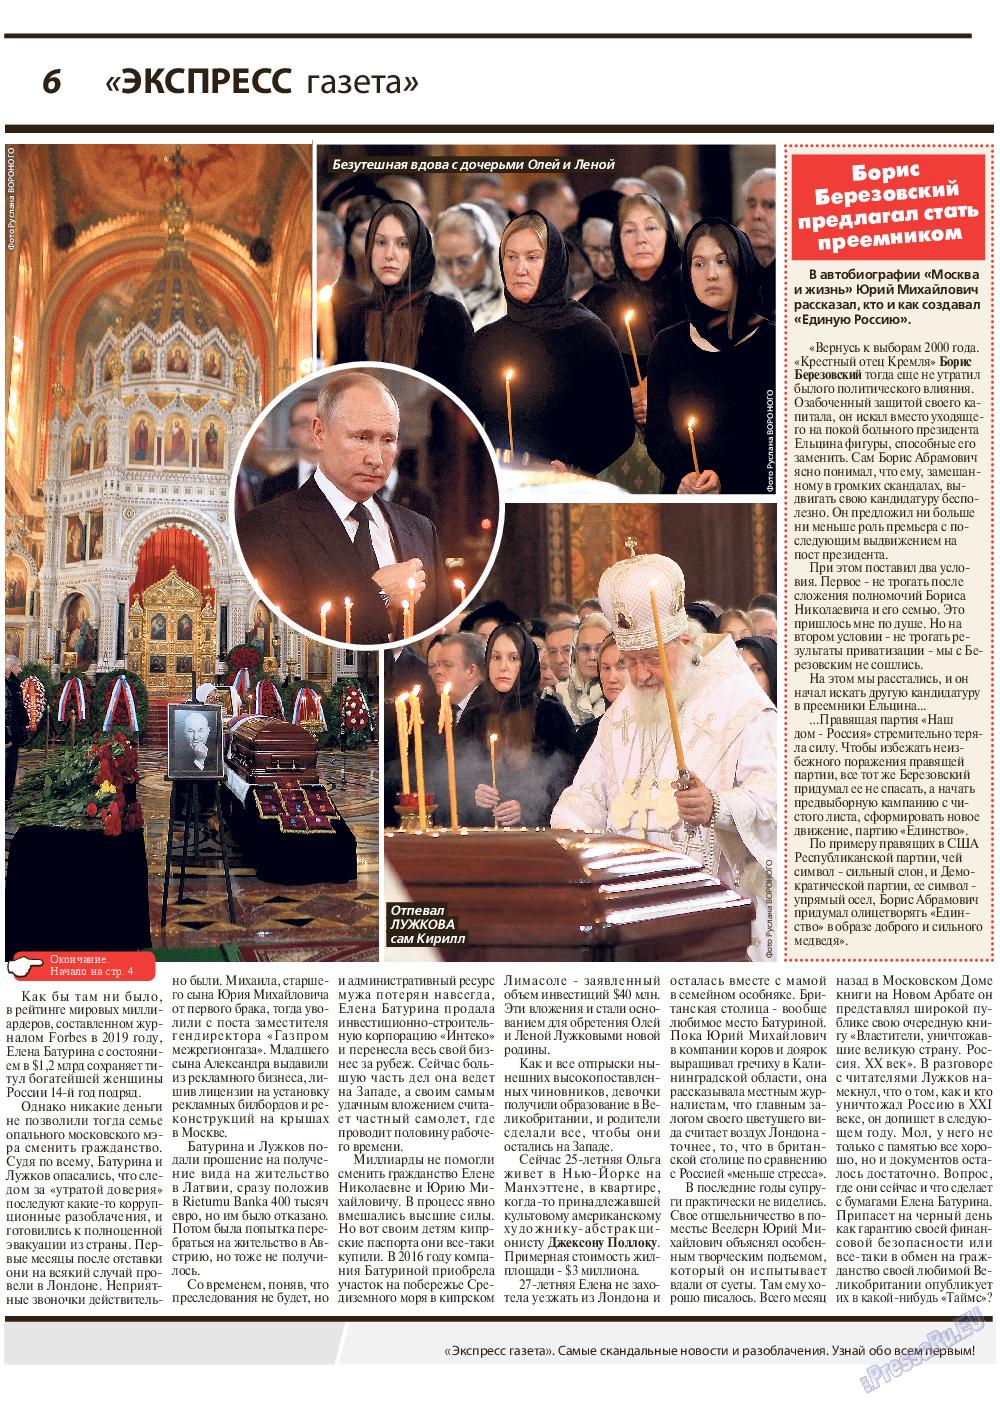 Экспресс газета (газета). 2020 год, номер 1, стр. 6